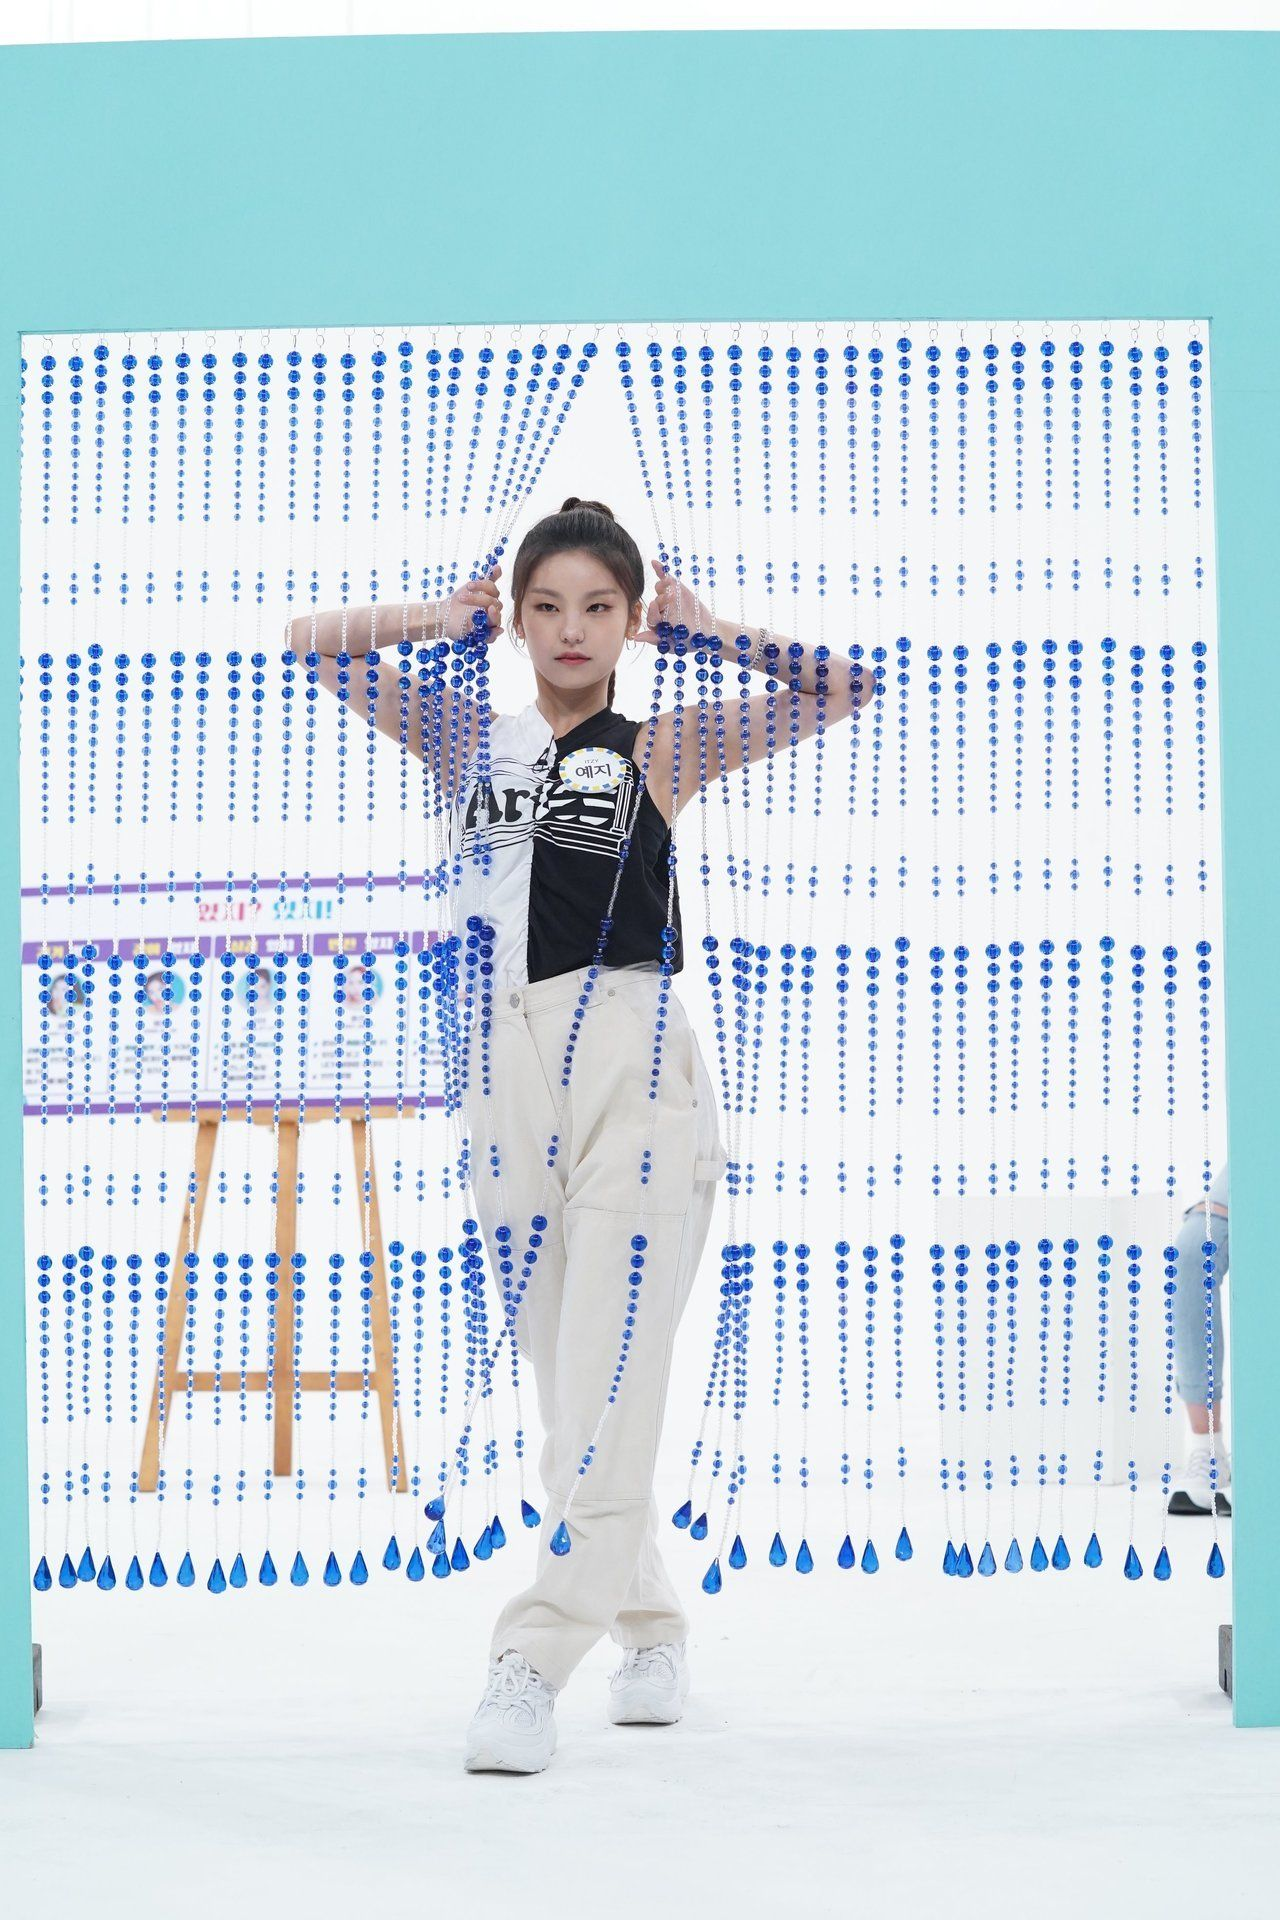 Pin de Tsang Eric em Korean / Actress / Singer Musical